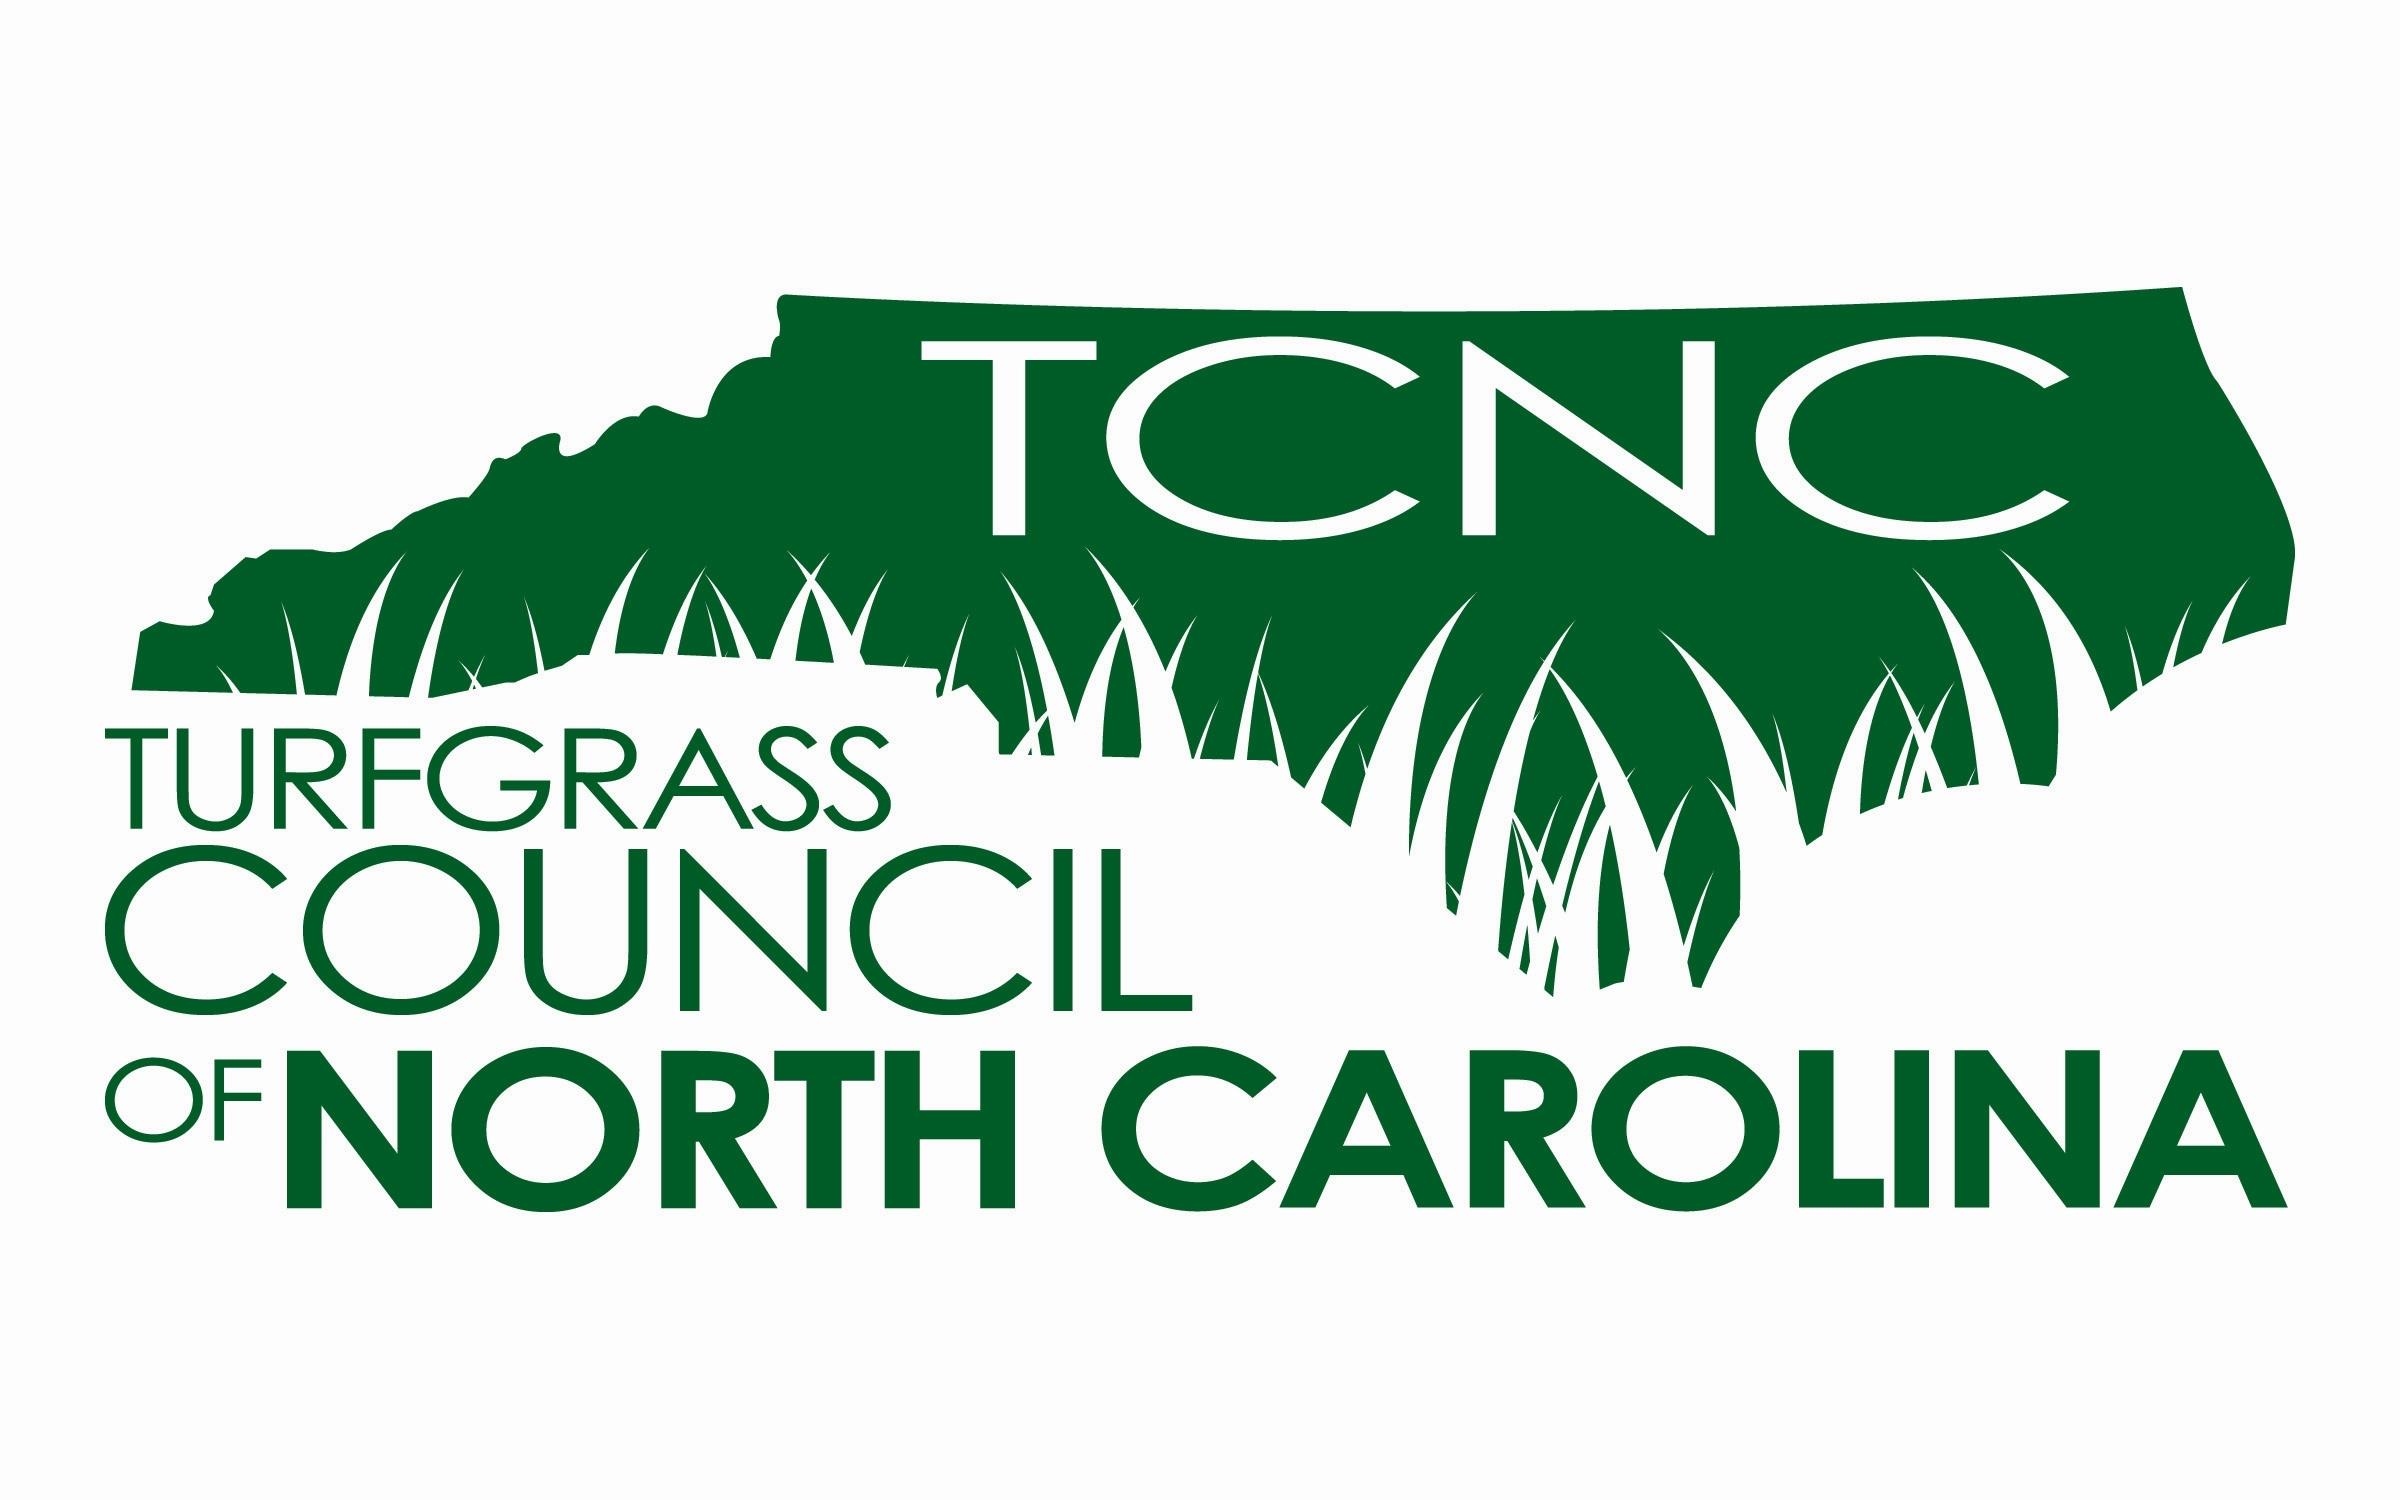 Turfgrass Council of North Carolian logo